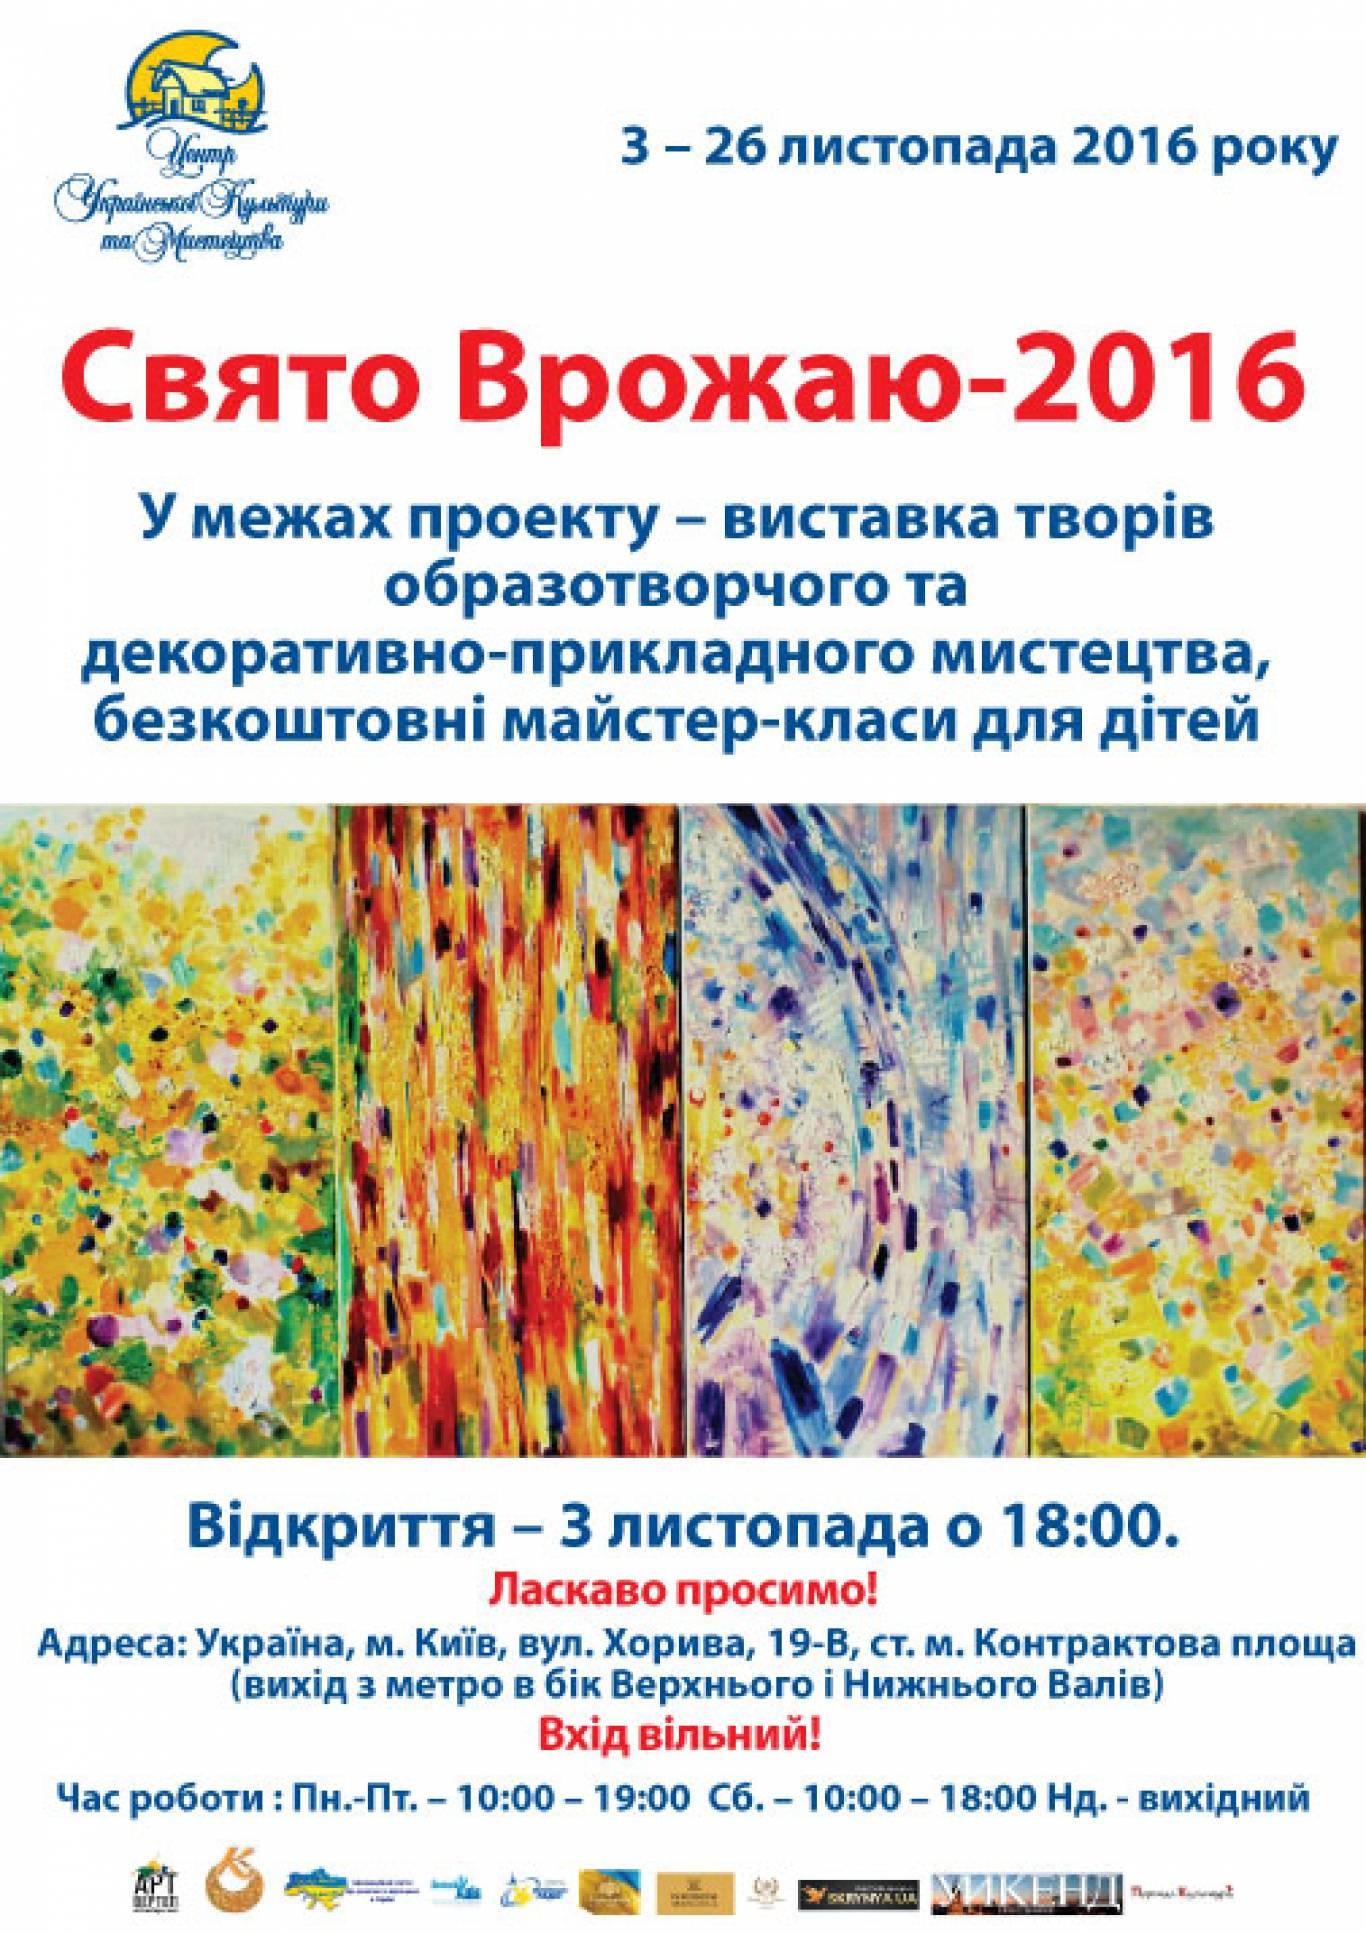 Свято Врожаю-2016